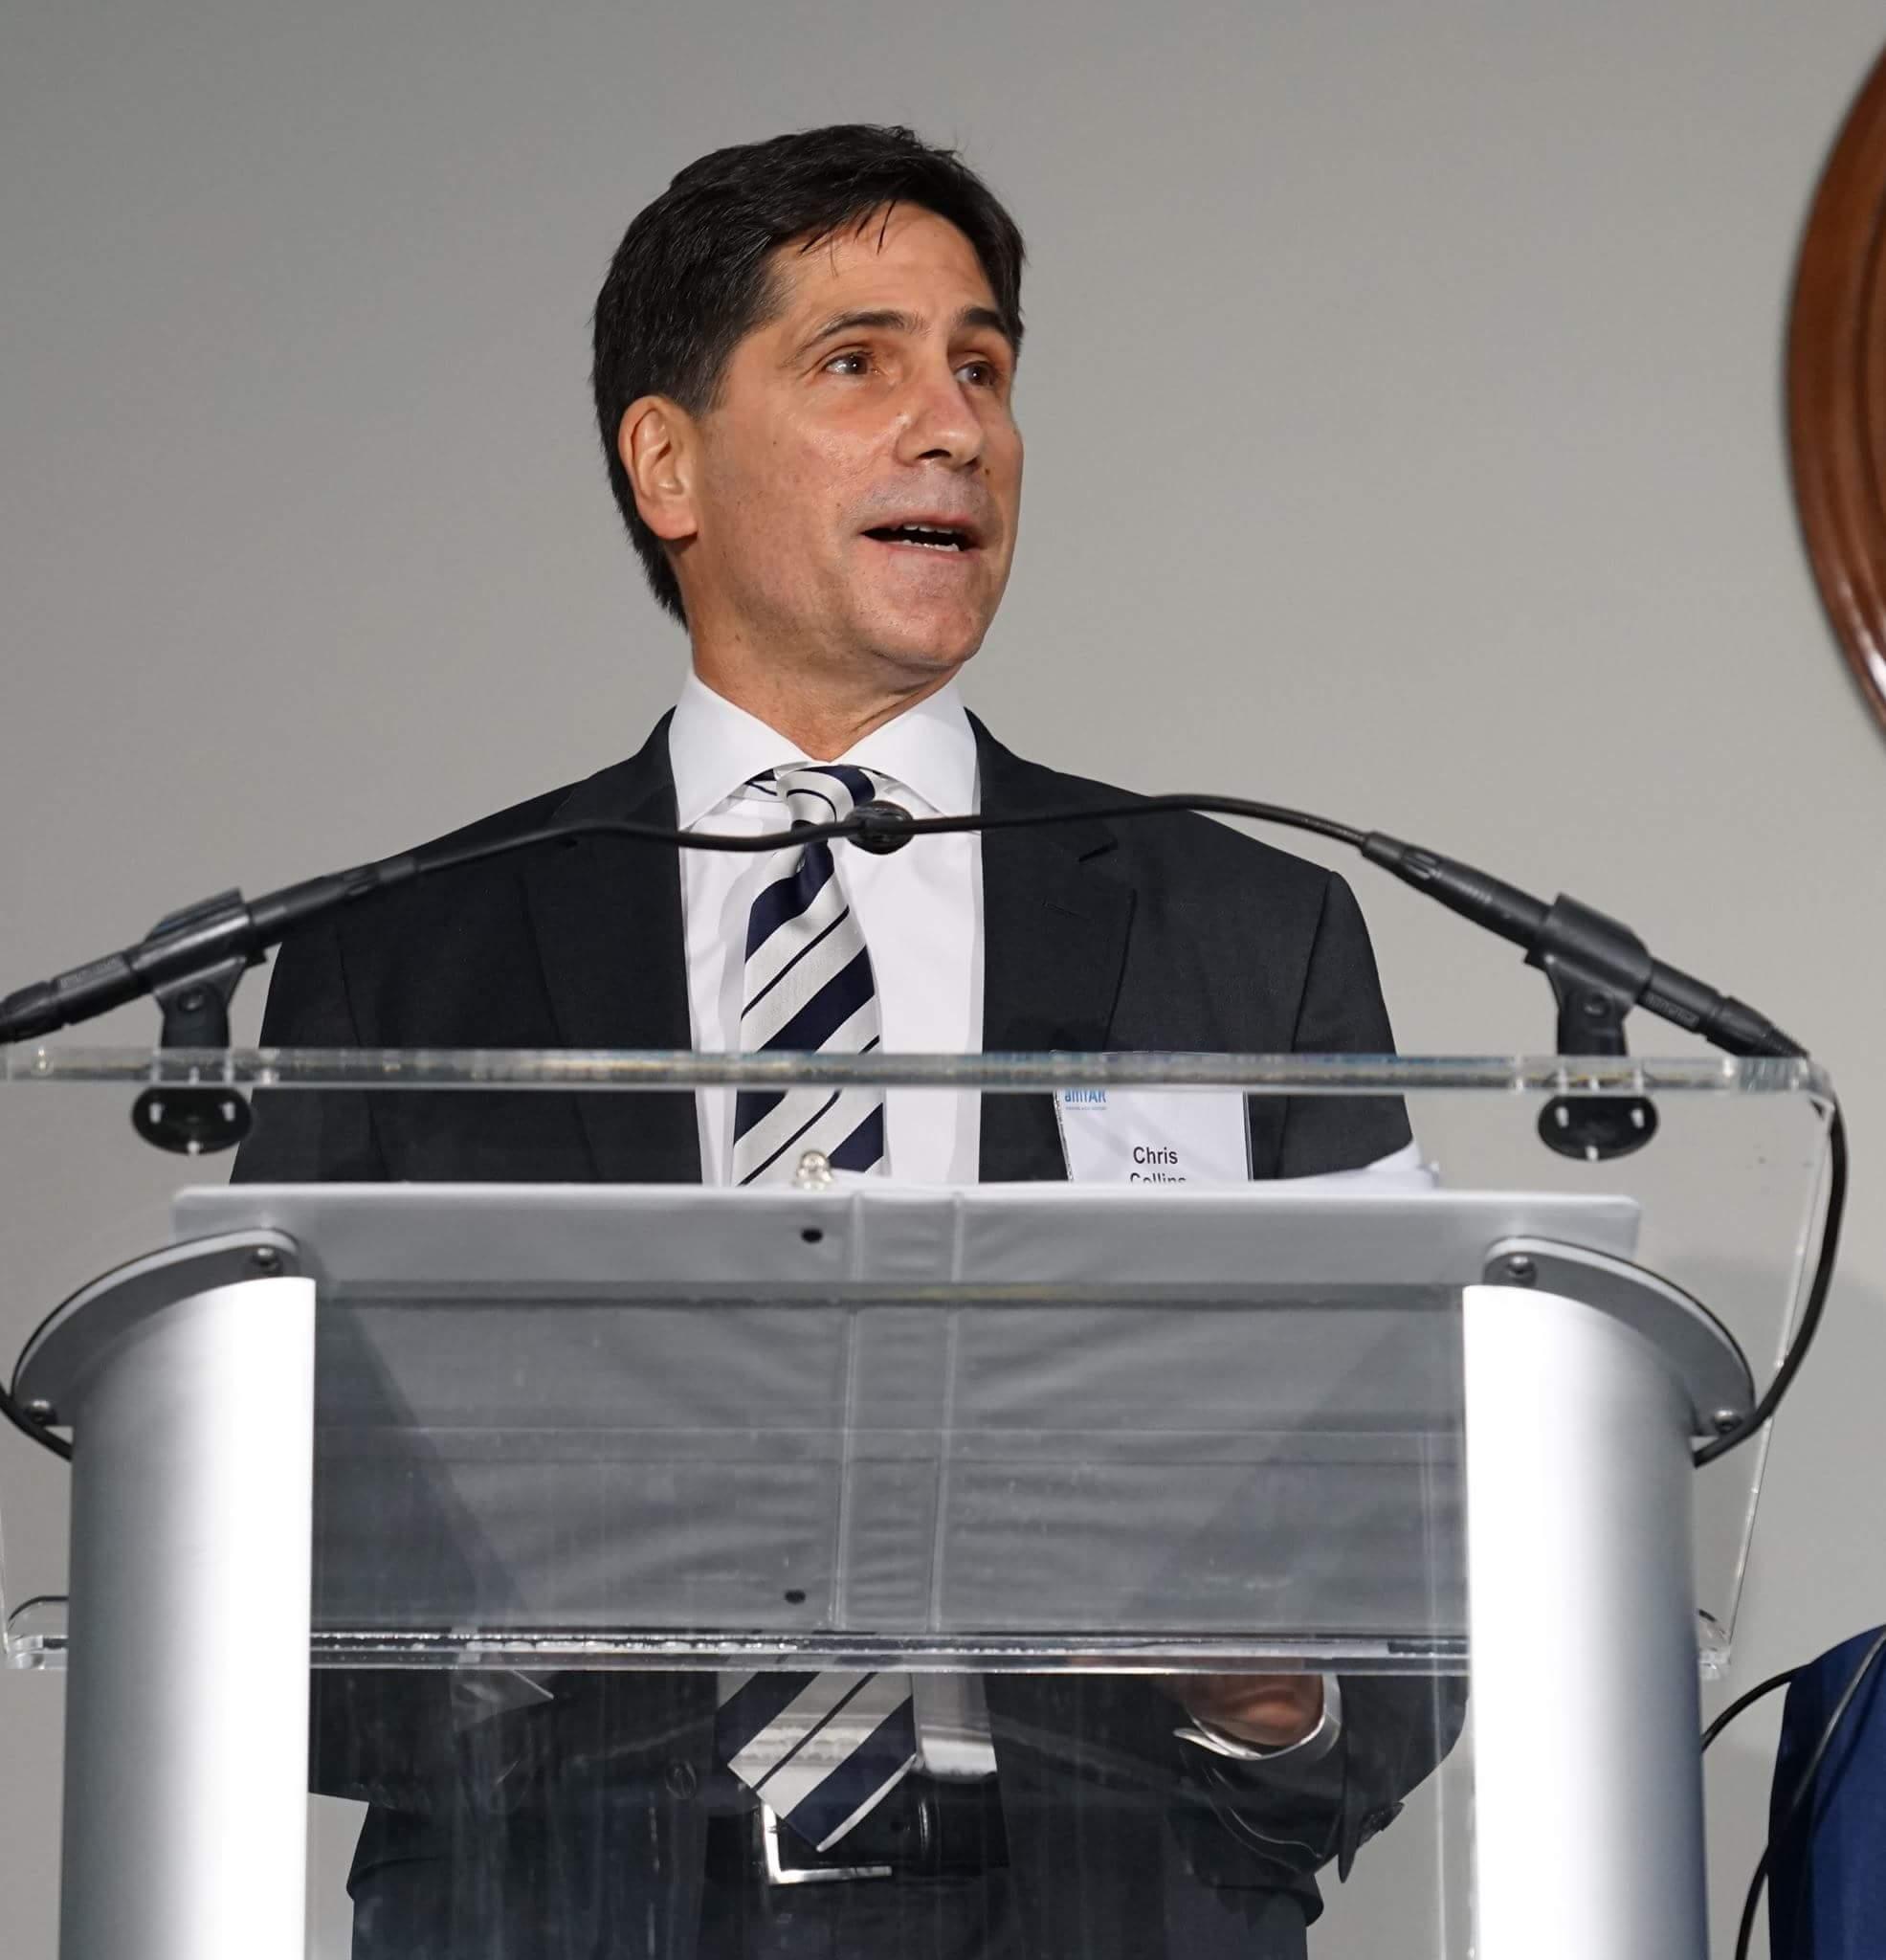 Addressing the amfAR Capitol Hill Conference. (Photo: amfAR)